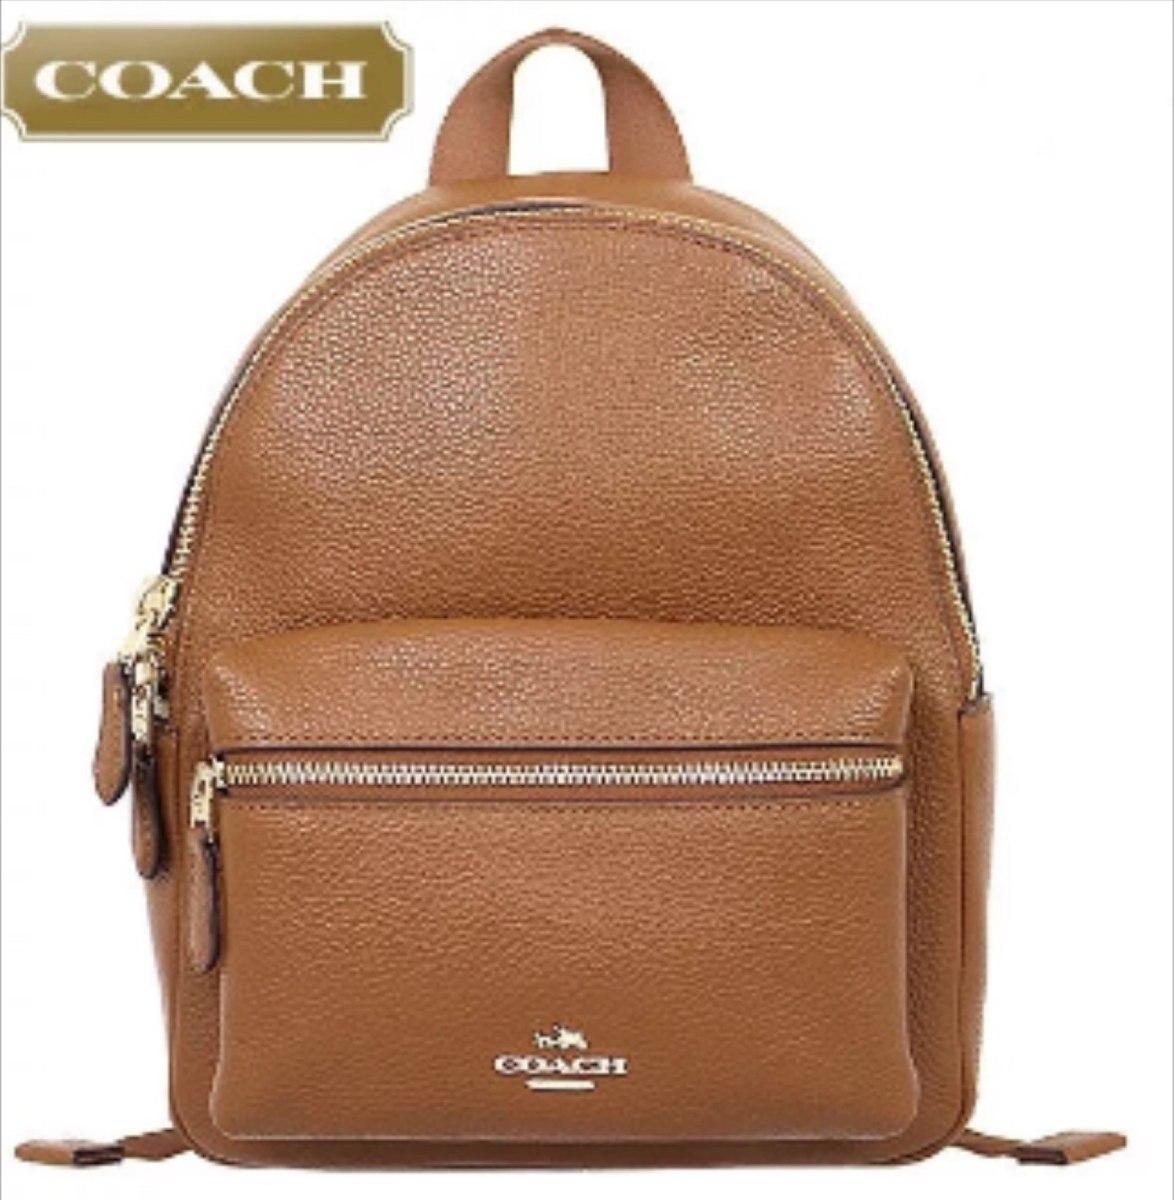 Backpack Coach Bolsa Mk Back Pack Mochila Original Mini -   4 6a19058d64d